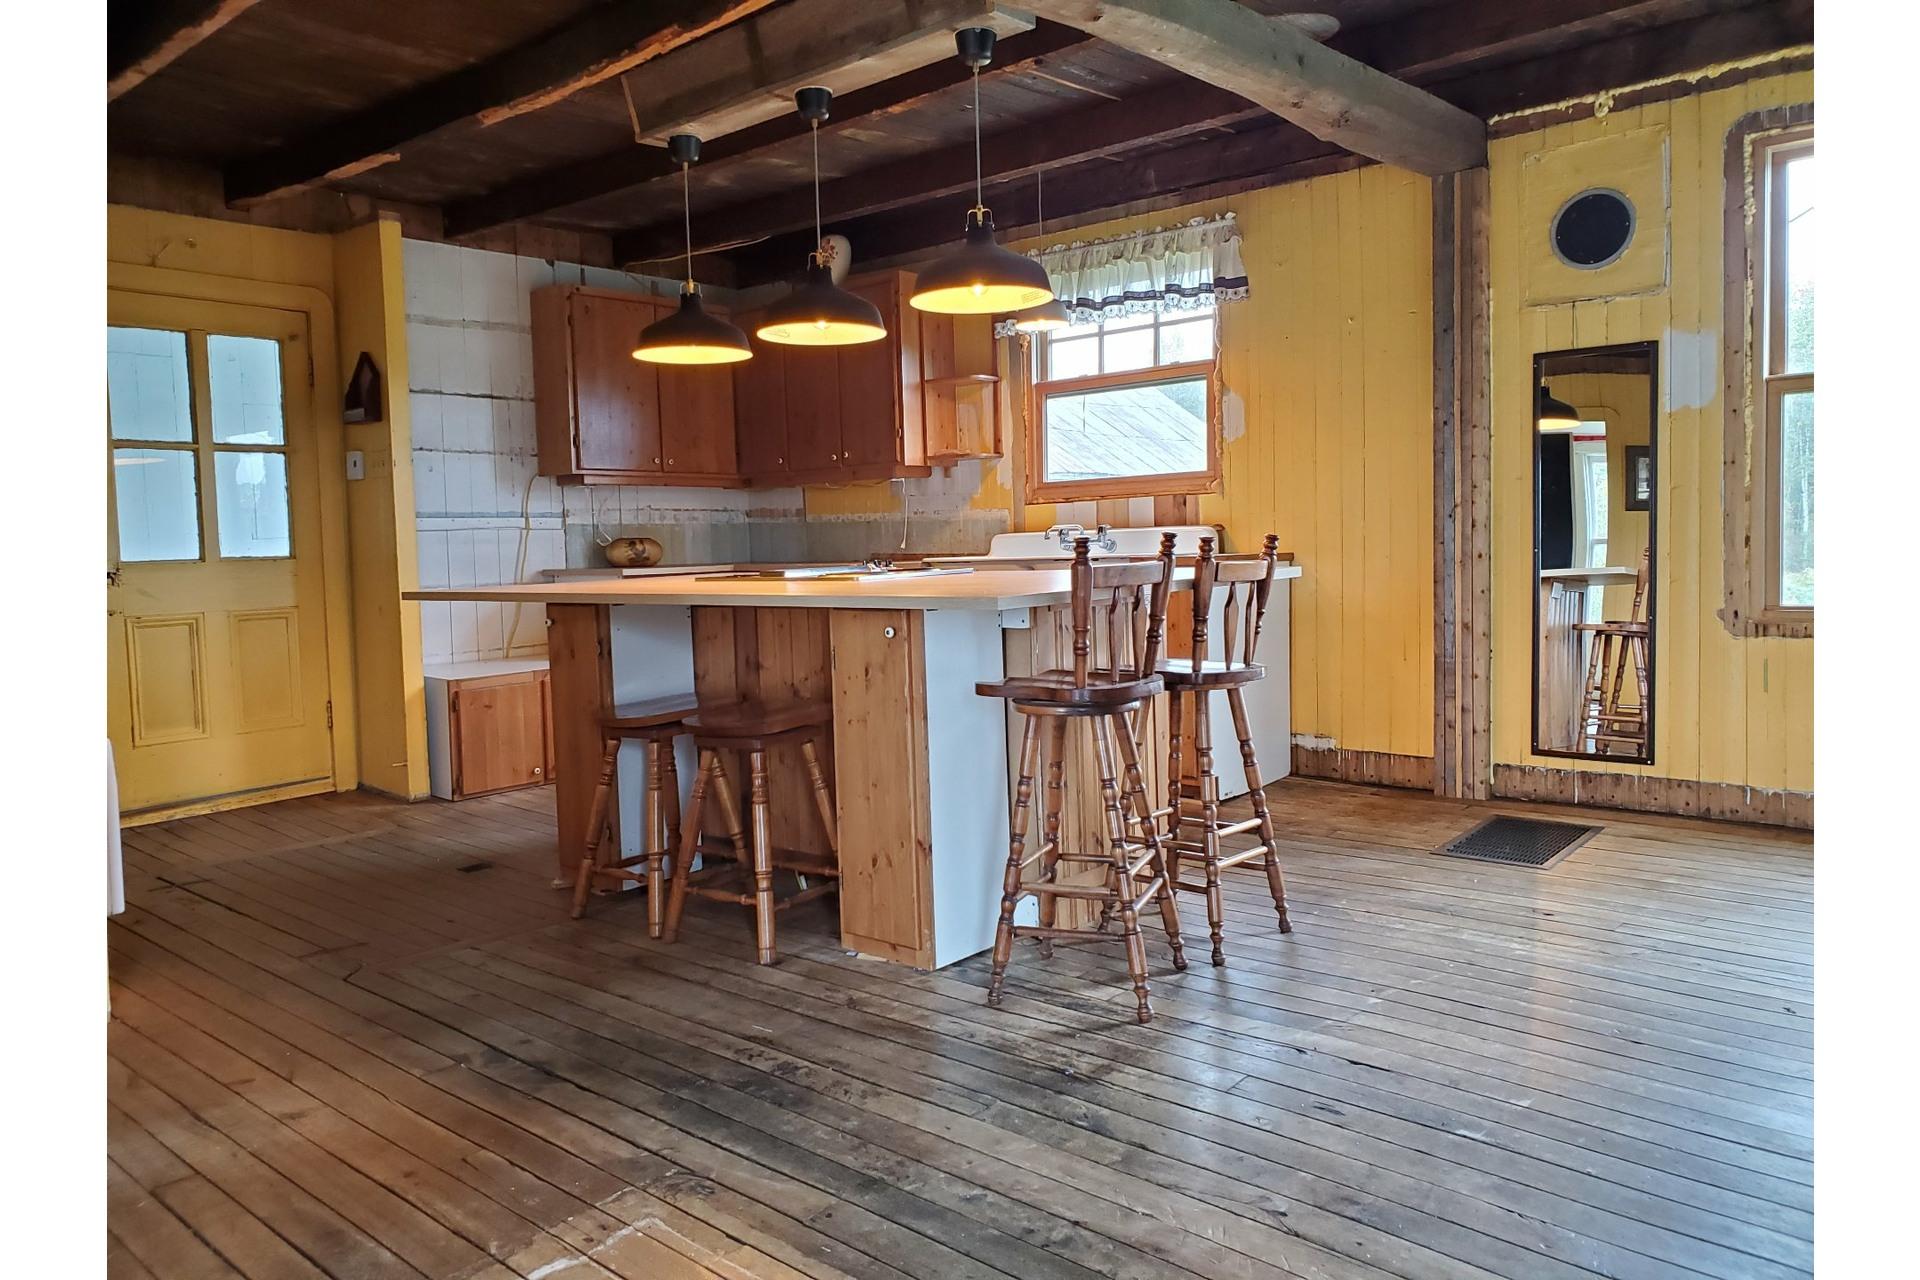 image 20 - Farmhouse For sale Sainte-Marie-de-Blandford - 10 rooms